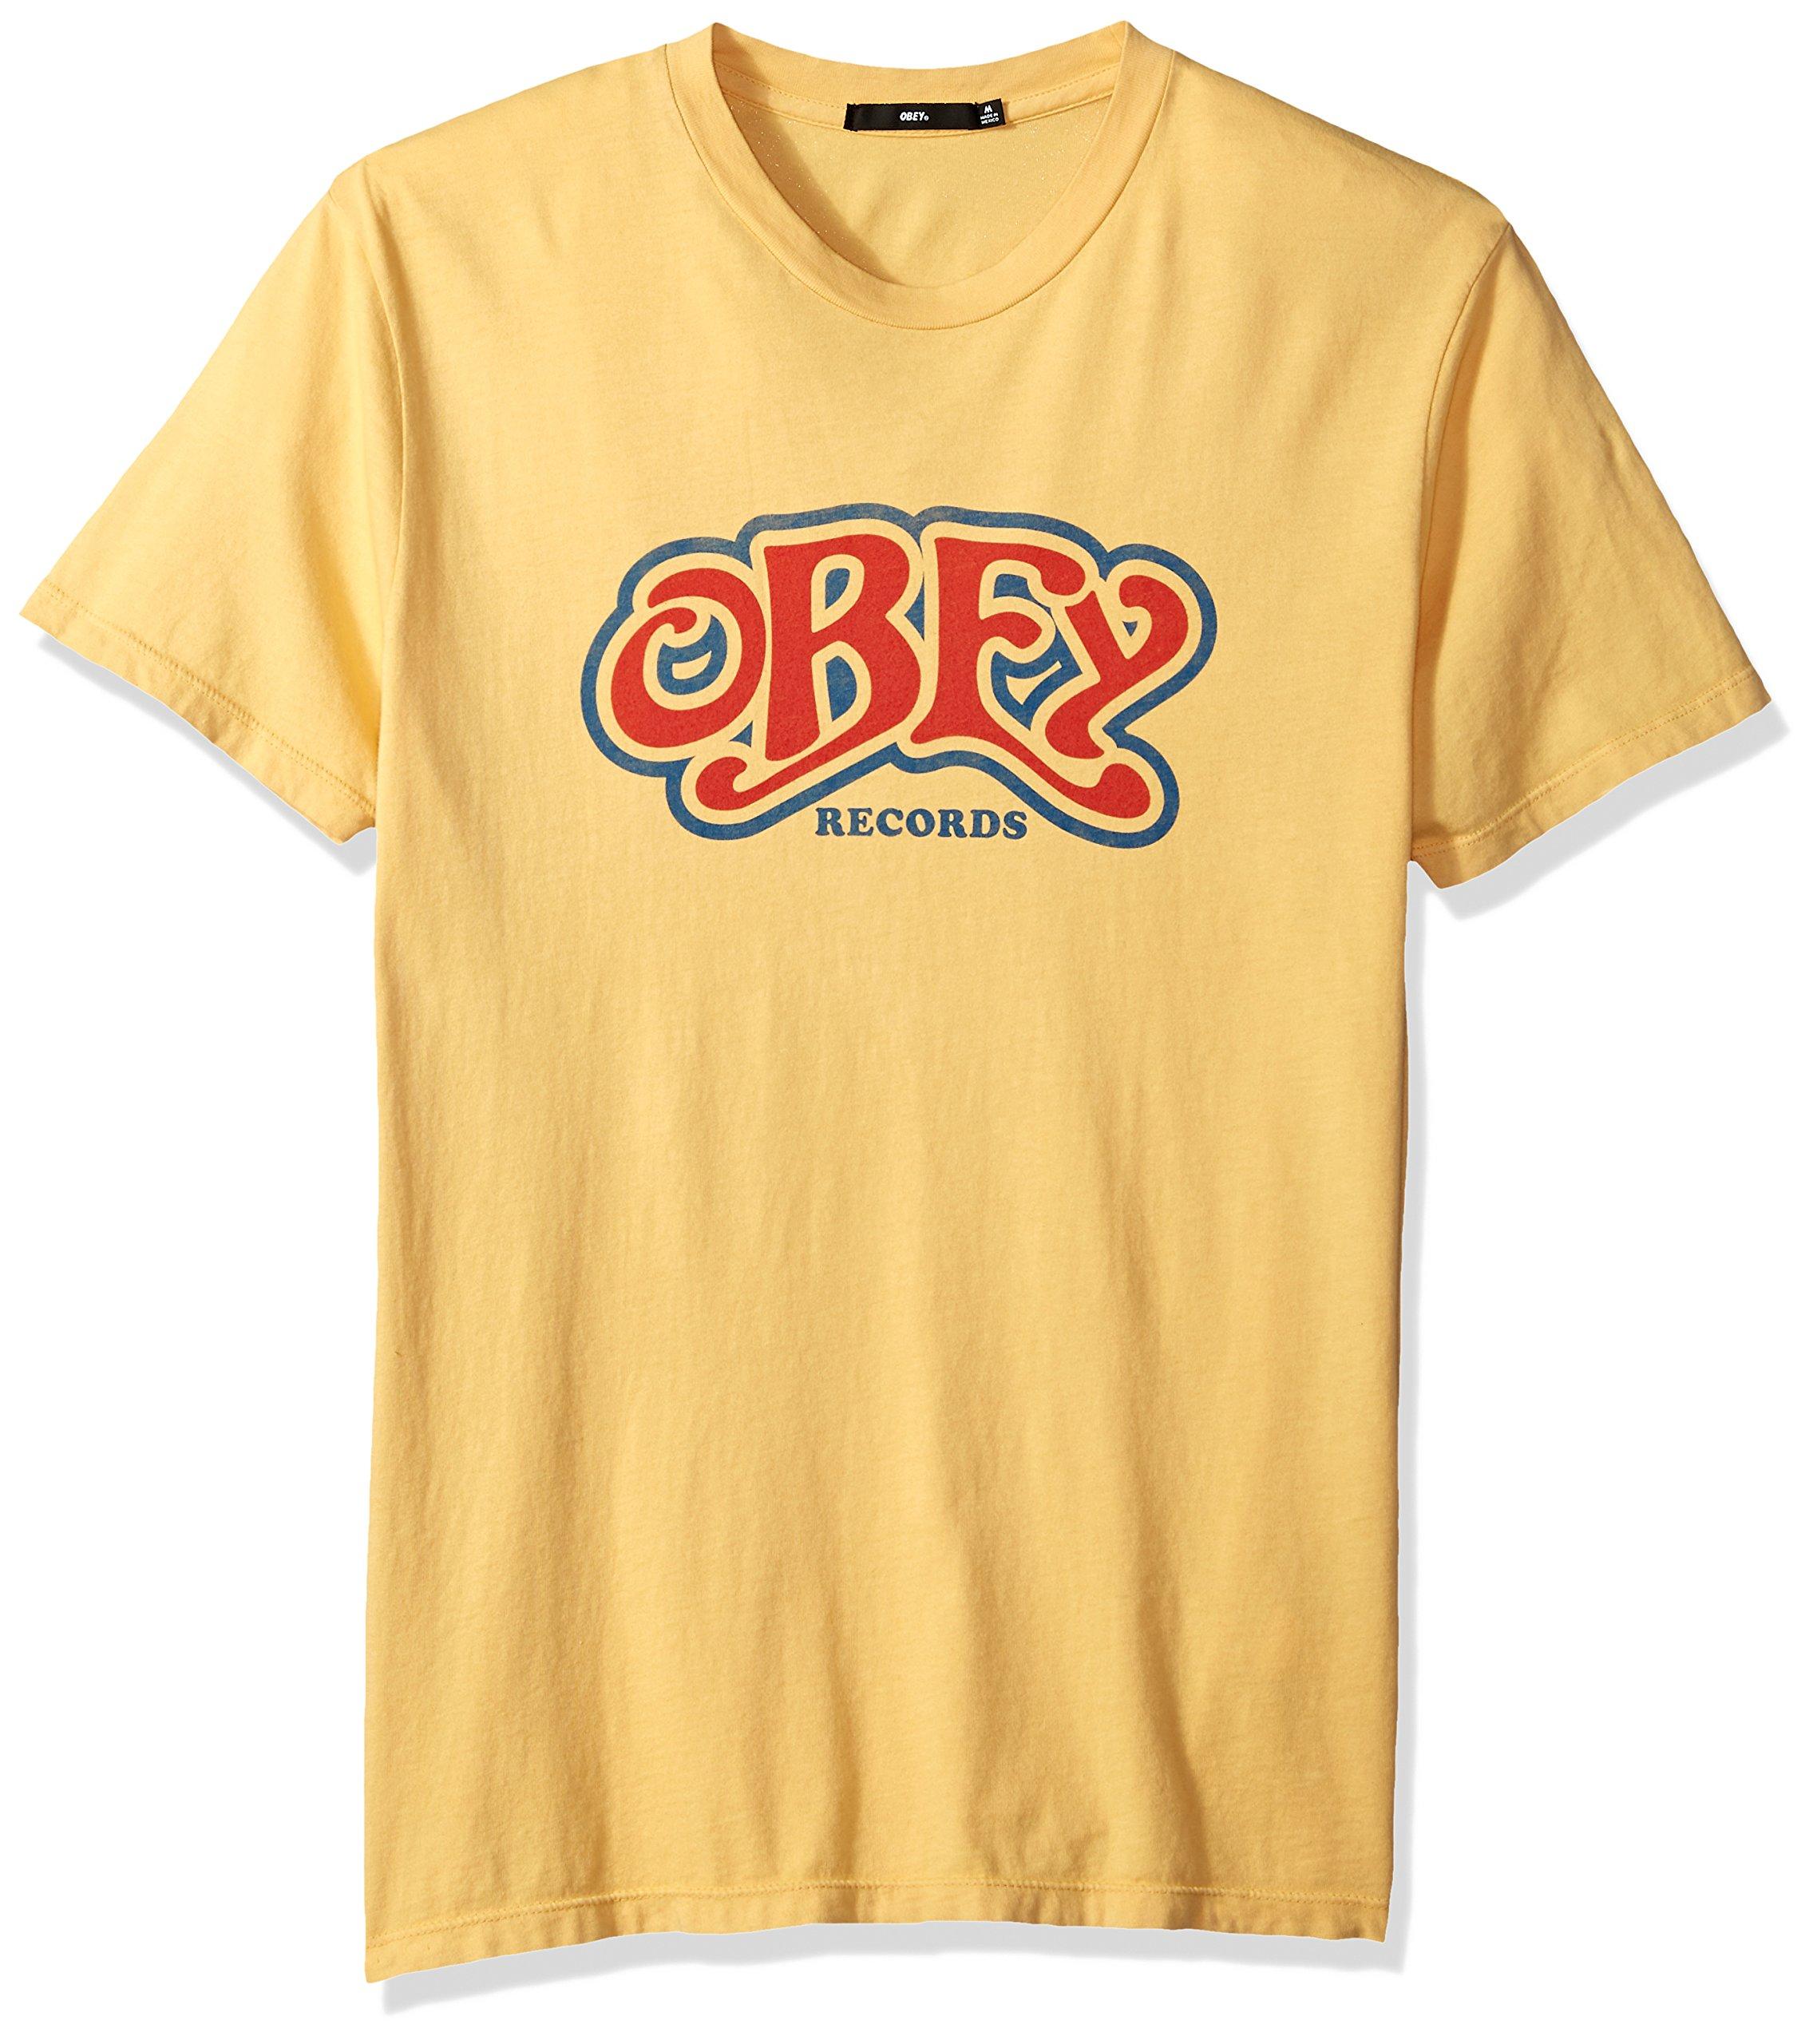 Obey Men's Cumberland Crewneck T-Shirt, Yellow, L